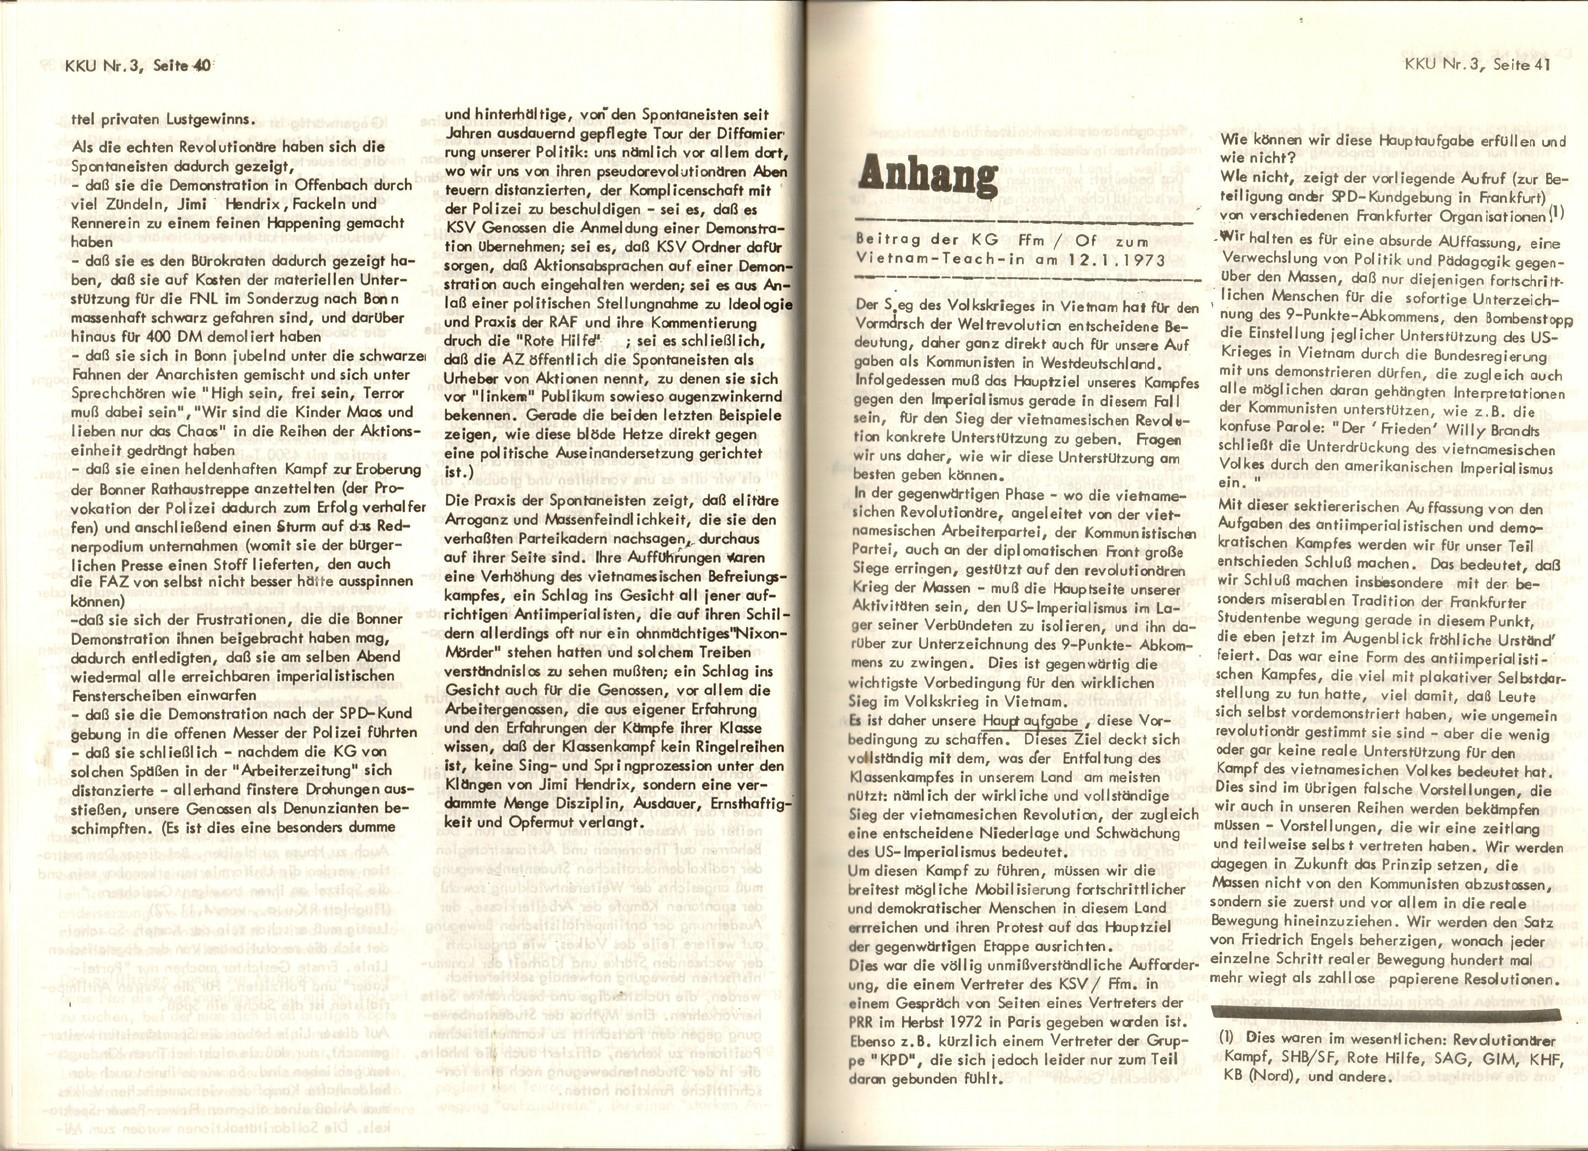 Frankfurt_Offenbach_KG_Kampf_Kritik_Umgestaltung_1973_03_22